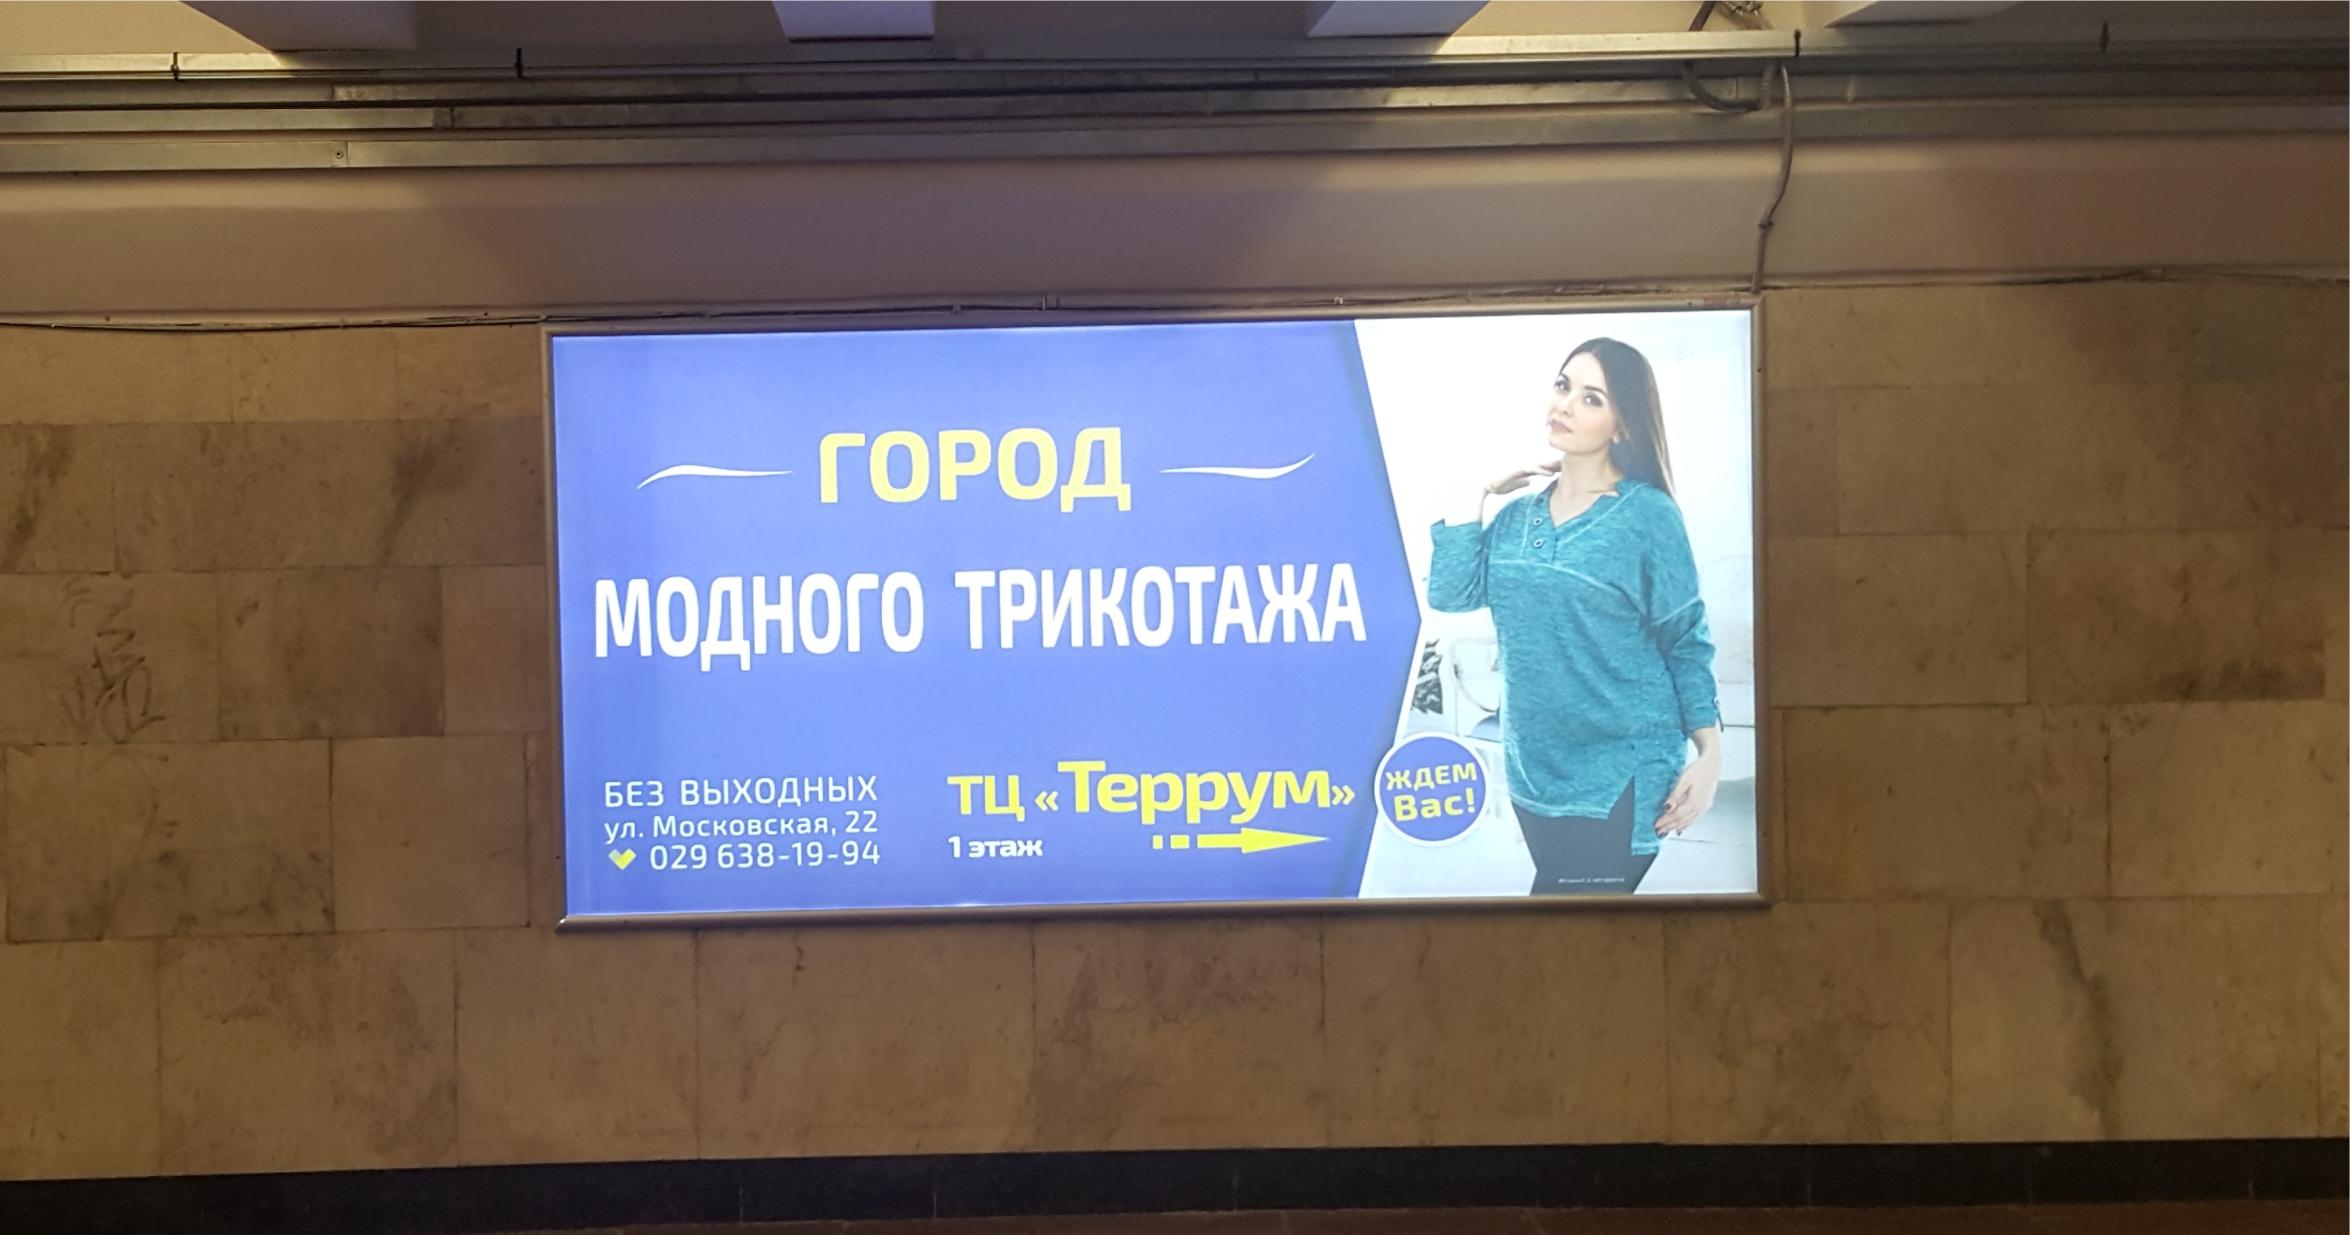 Ультраяркий световой лайтбокс на станции метро Каменная горка (переход) reklama-on.by